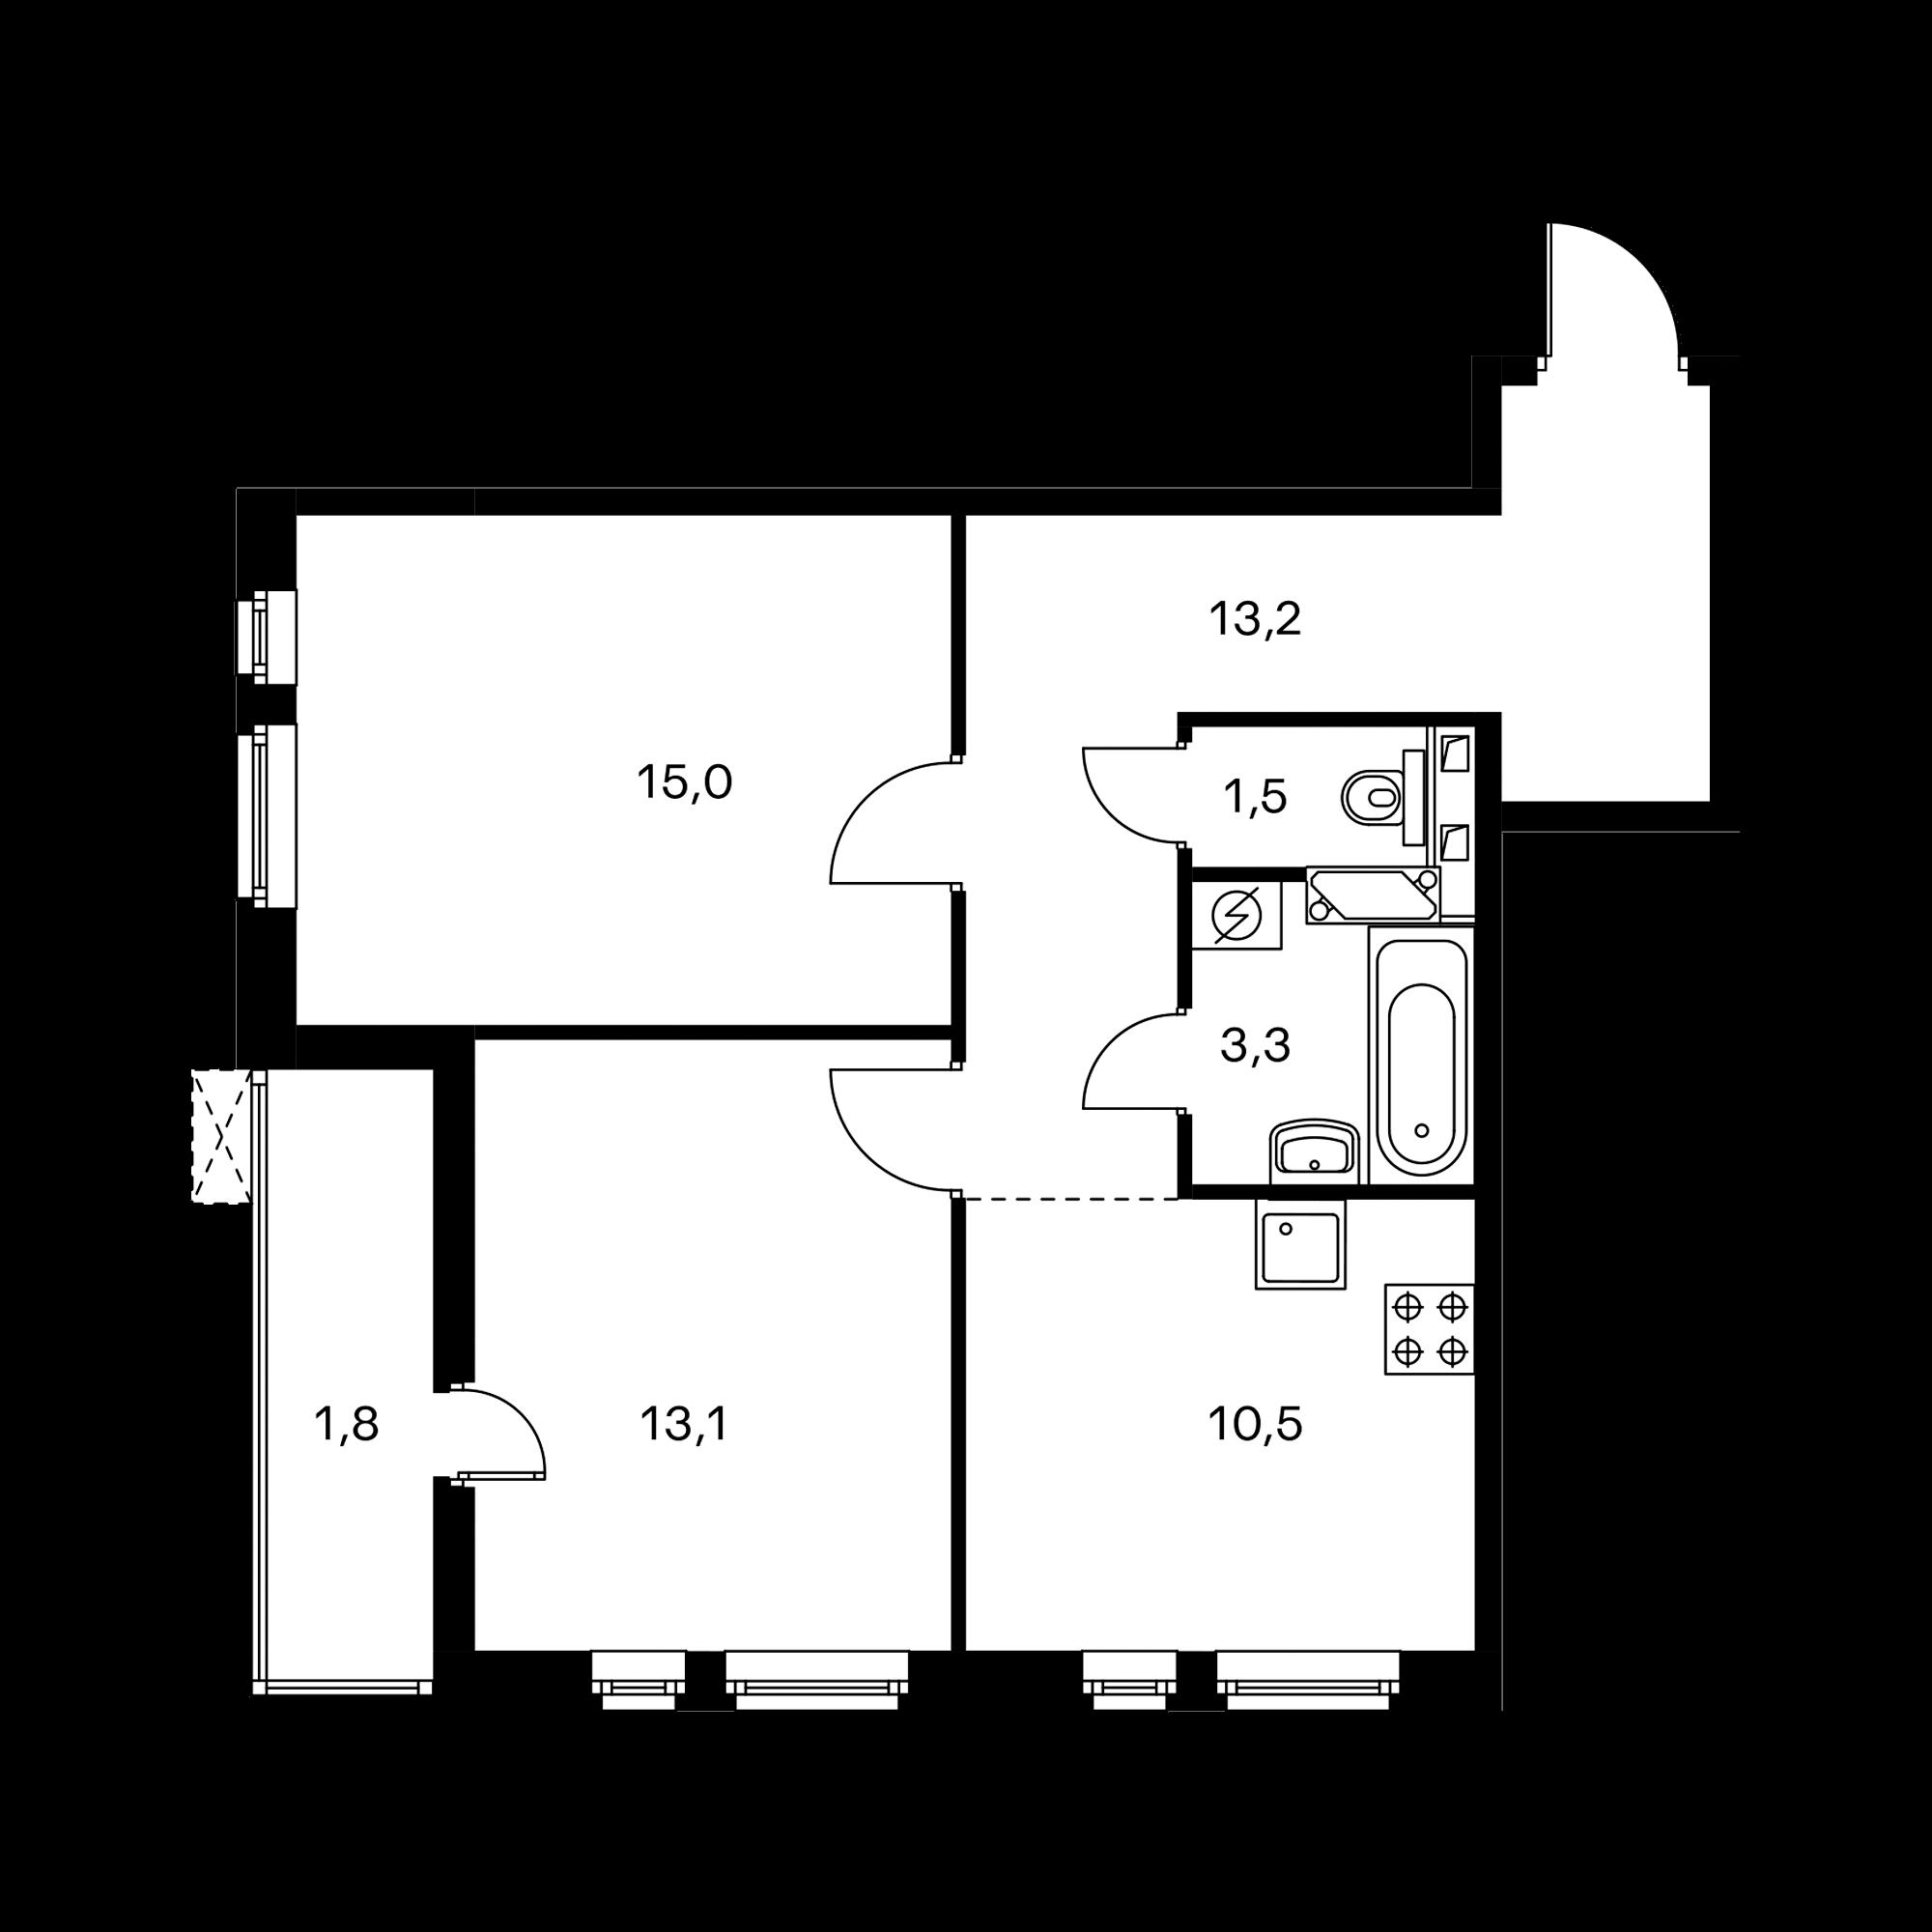 2-3(1Д)*